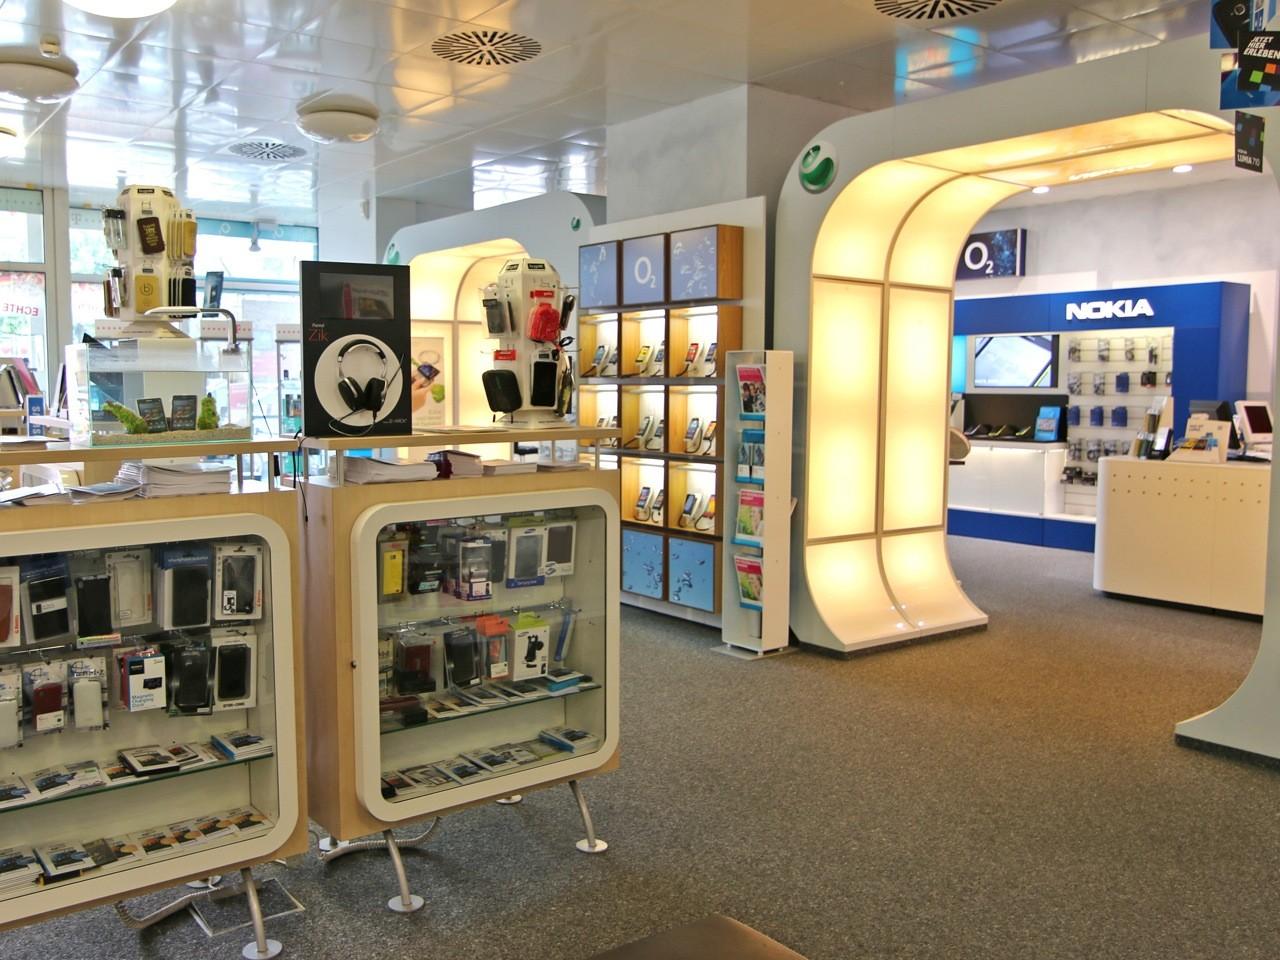 Große Auswahl an Handys aller Hersteller